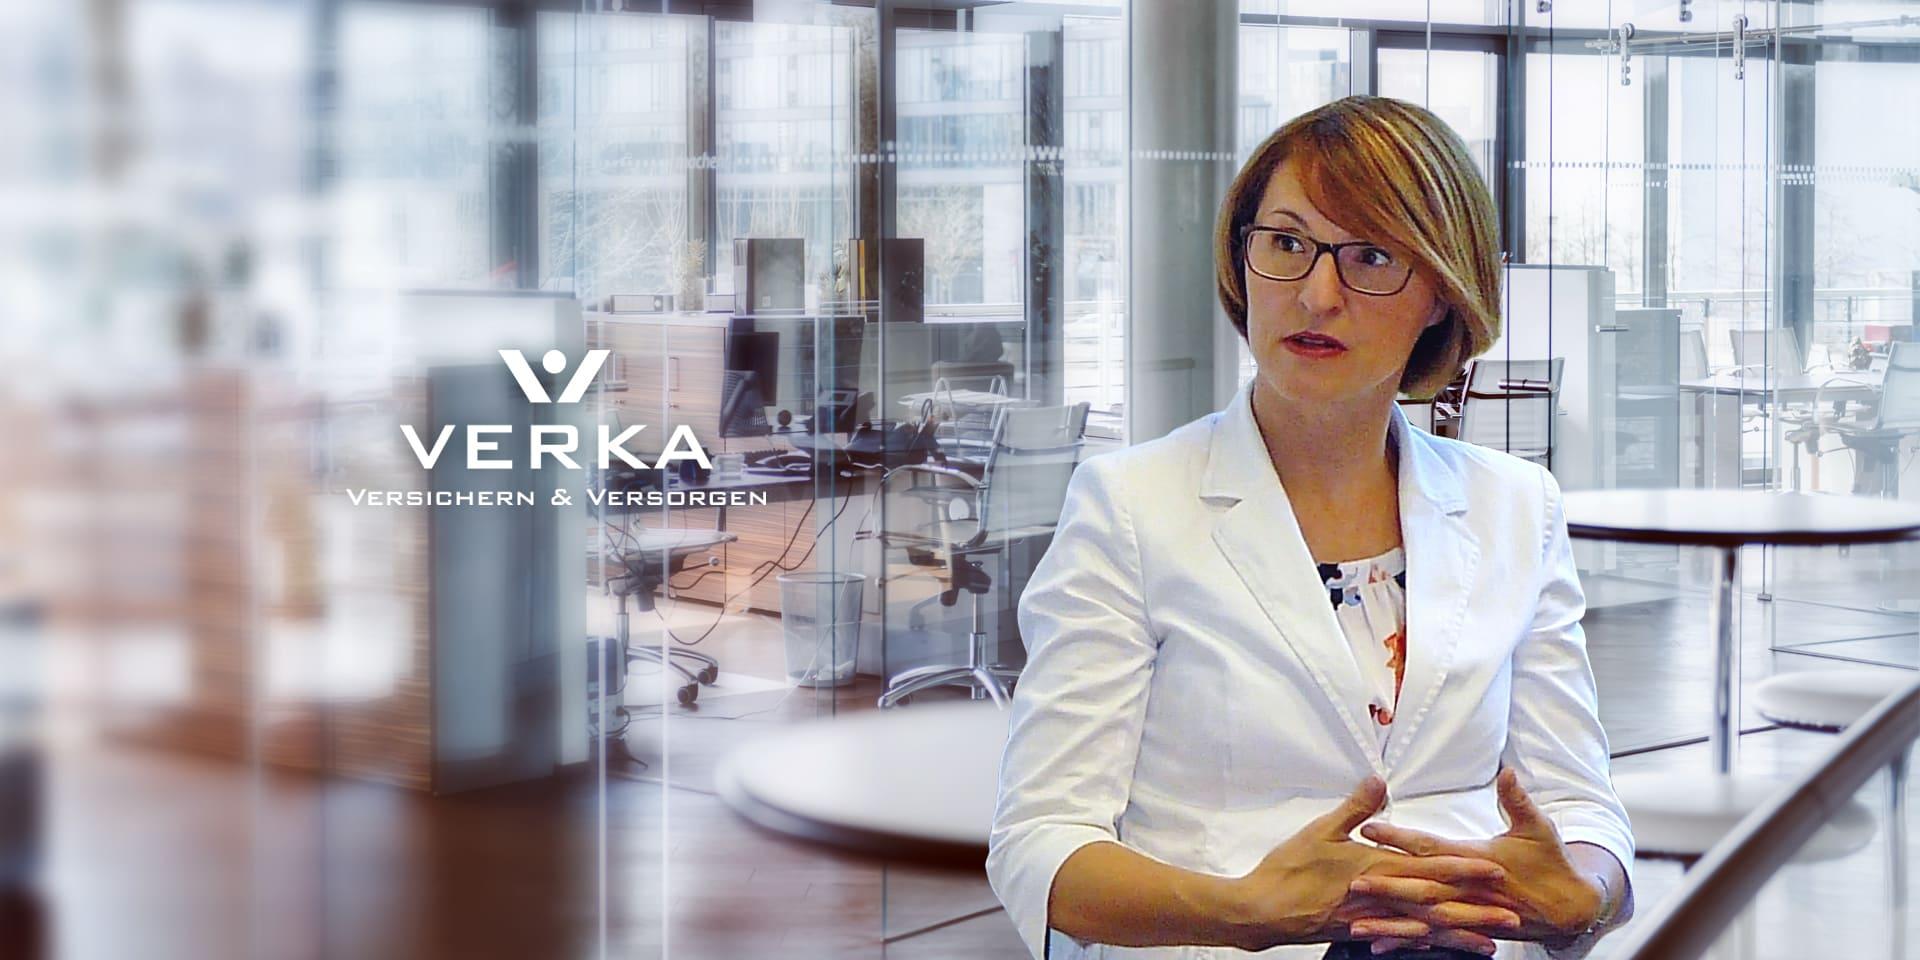 BPM-Kunden-Interview-Verka: Portrait-Claudia-Ibe-Göhler